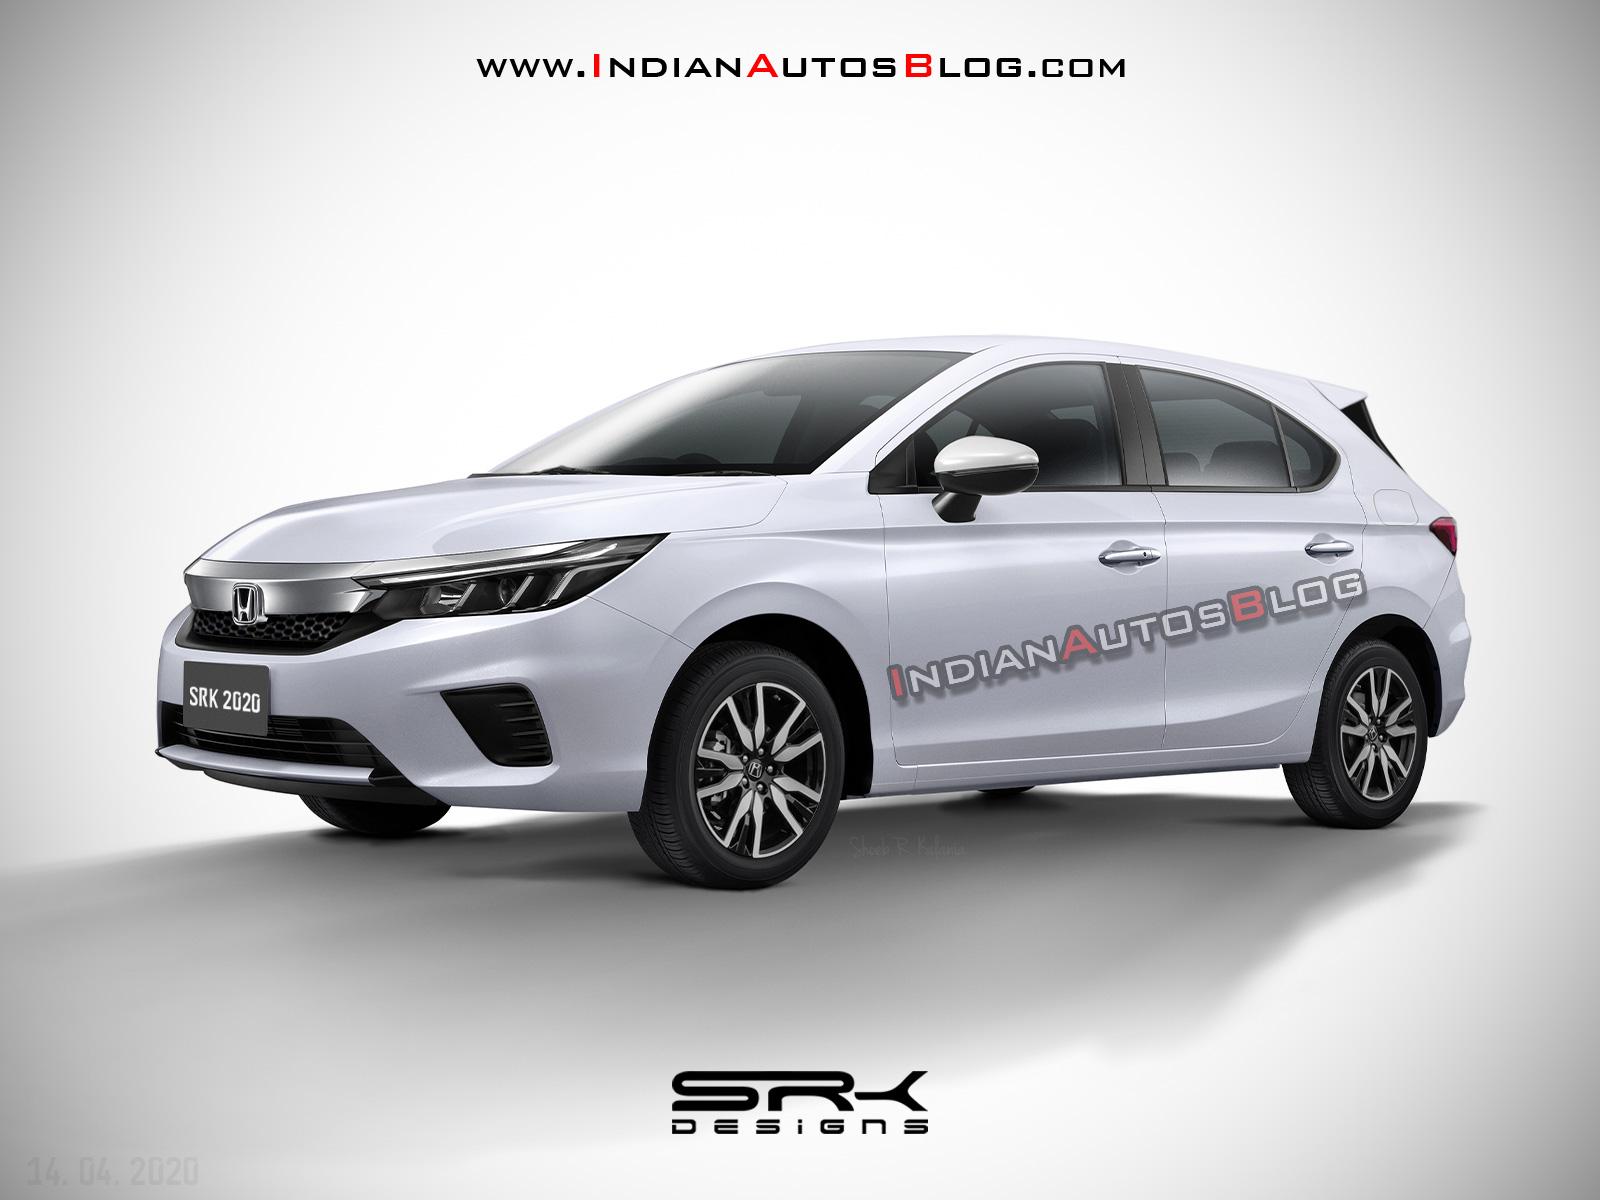 2020-honda-city-hatchback-white-front-rendering-f8b5